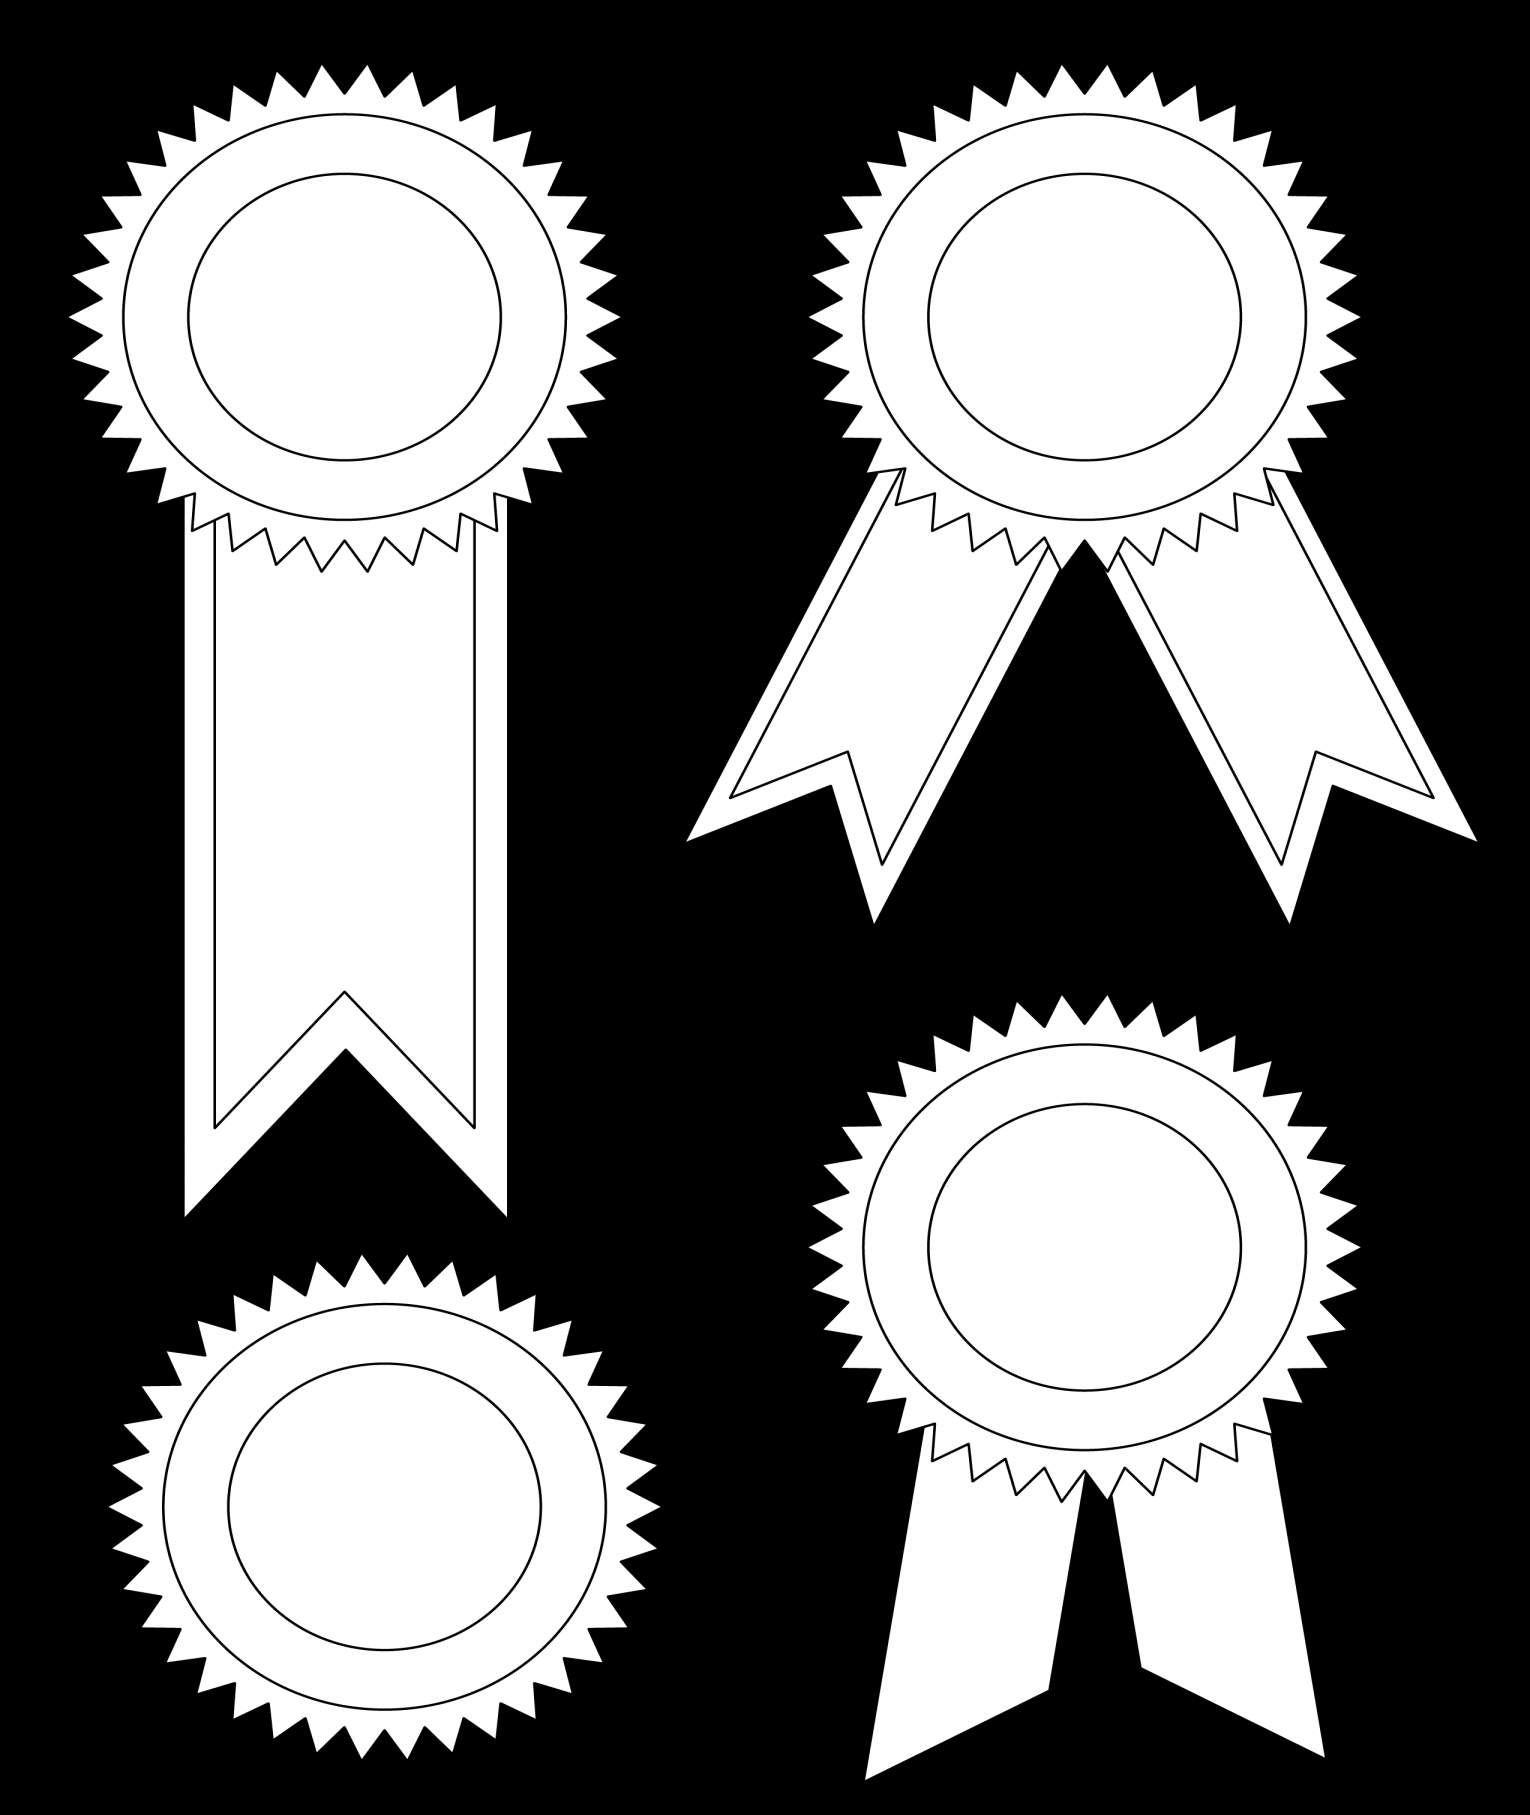 Template Award Ribbon Template Prize Template Award Ribbons Award Ribbon Quilting Crafts